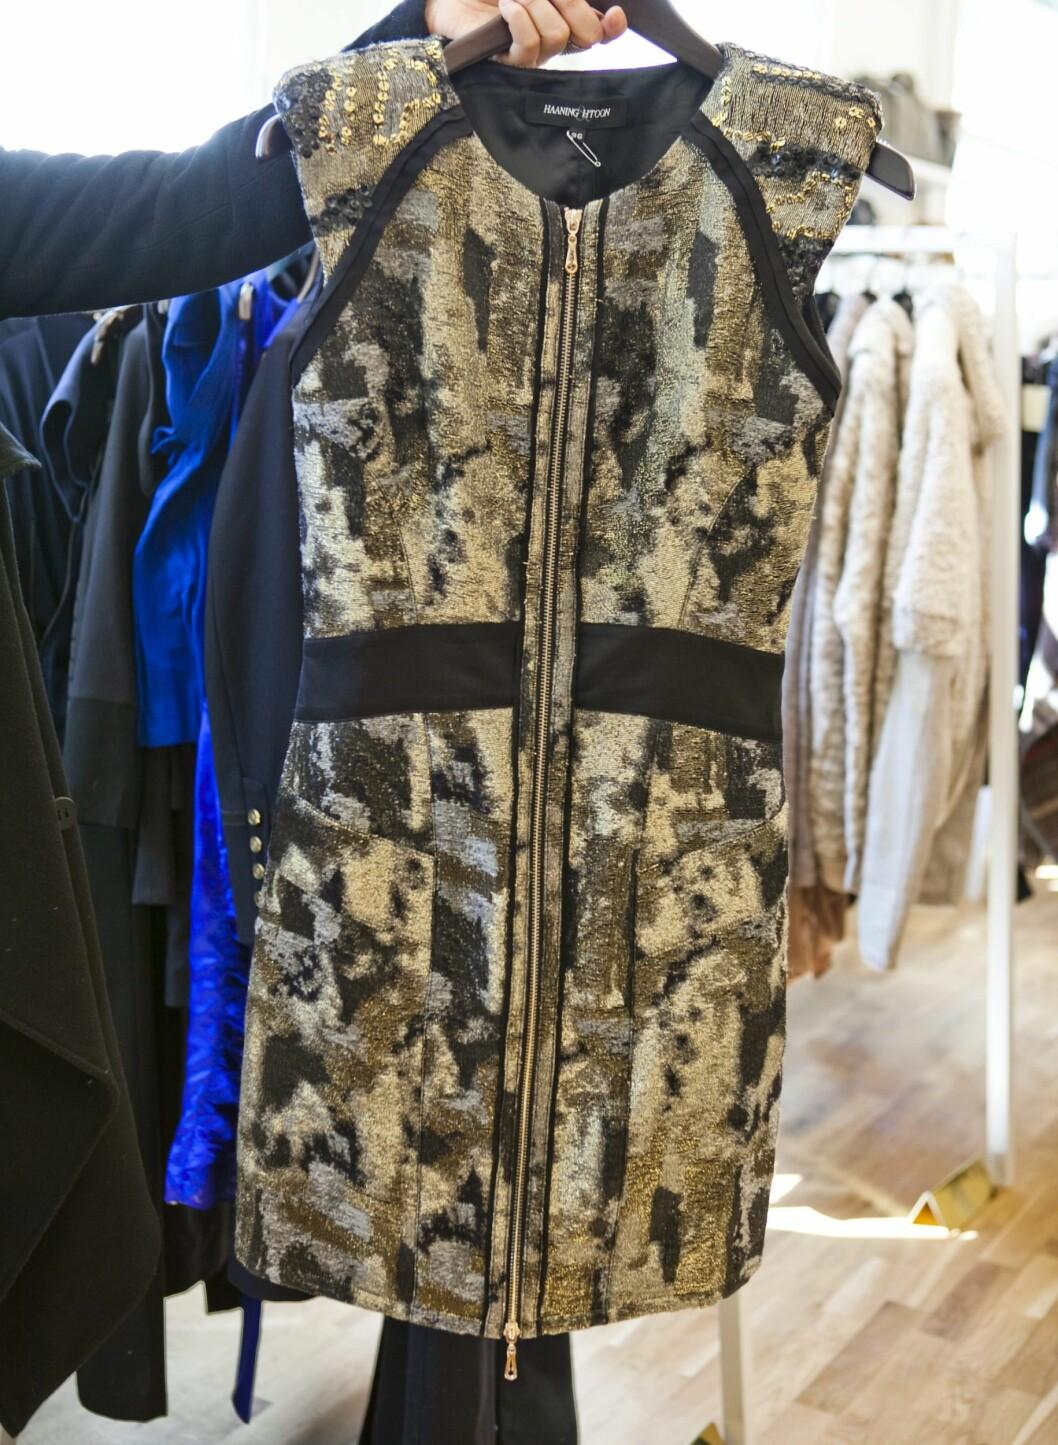 Kjole fra Haaning & Htoon (kr.4000). - Metallisk, rocka kjole med glidelås. Foto: Per Ervland